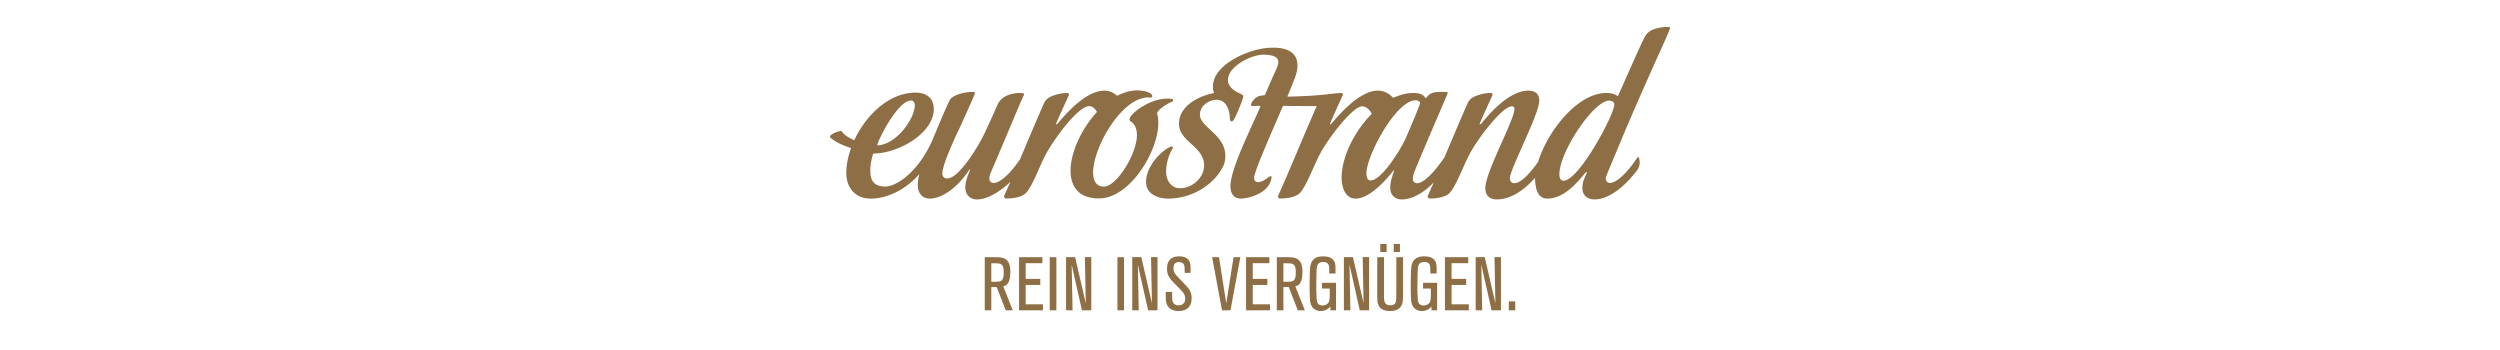 Erlebnisland Eurostrand